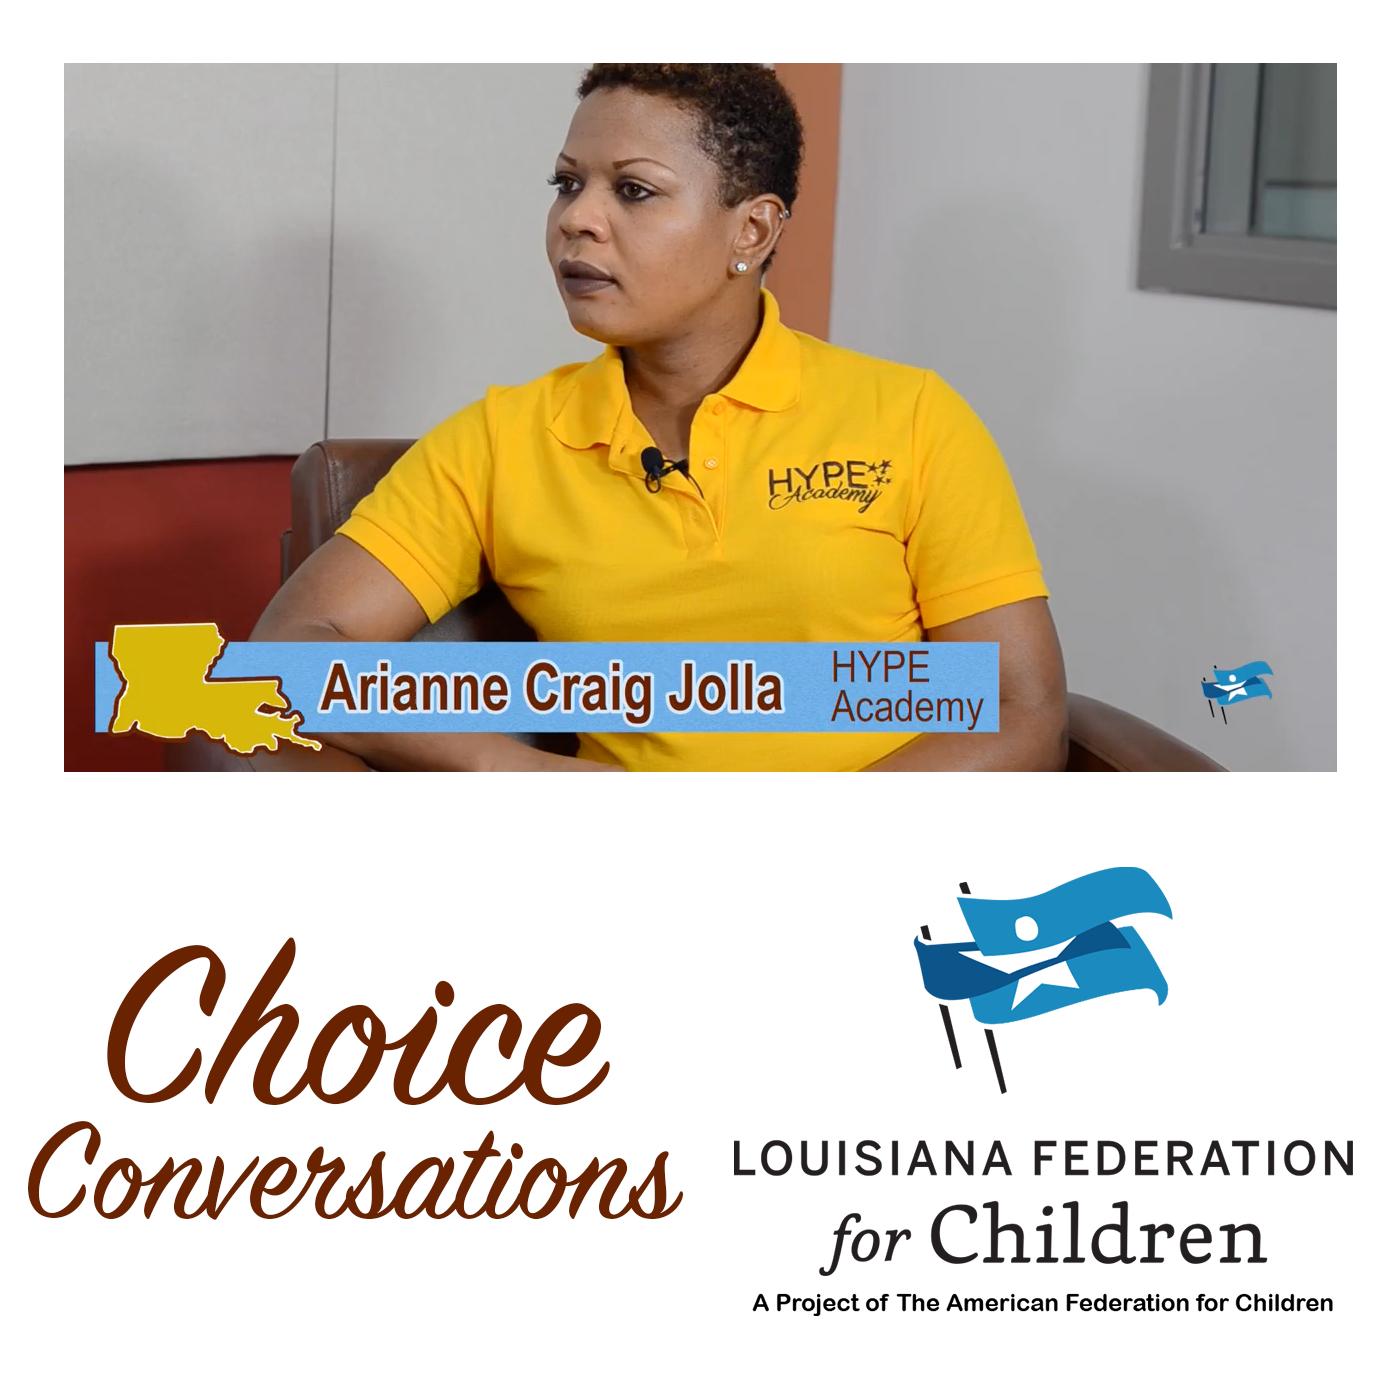 Arianne Craig Jolla – Founder, HYPE Academy (New Orleans, LA)